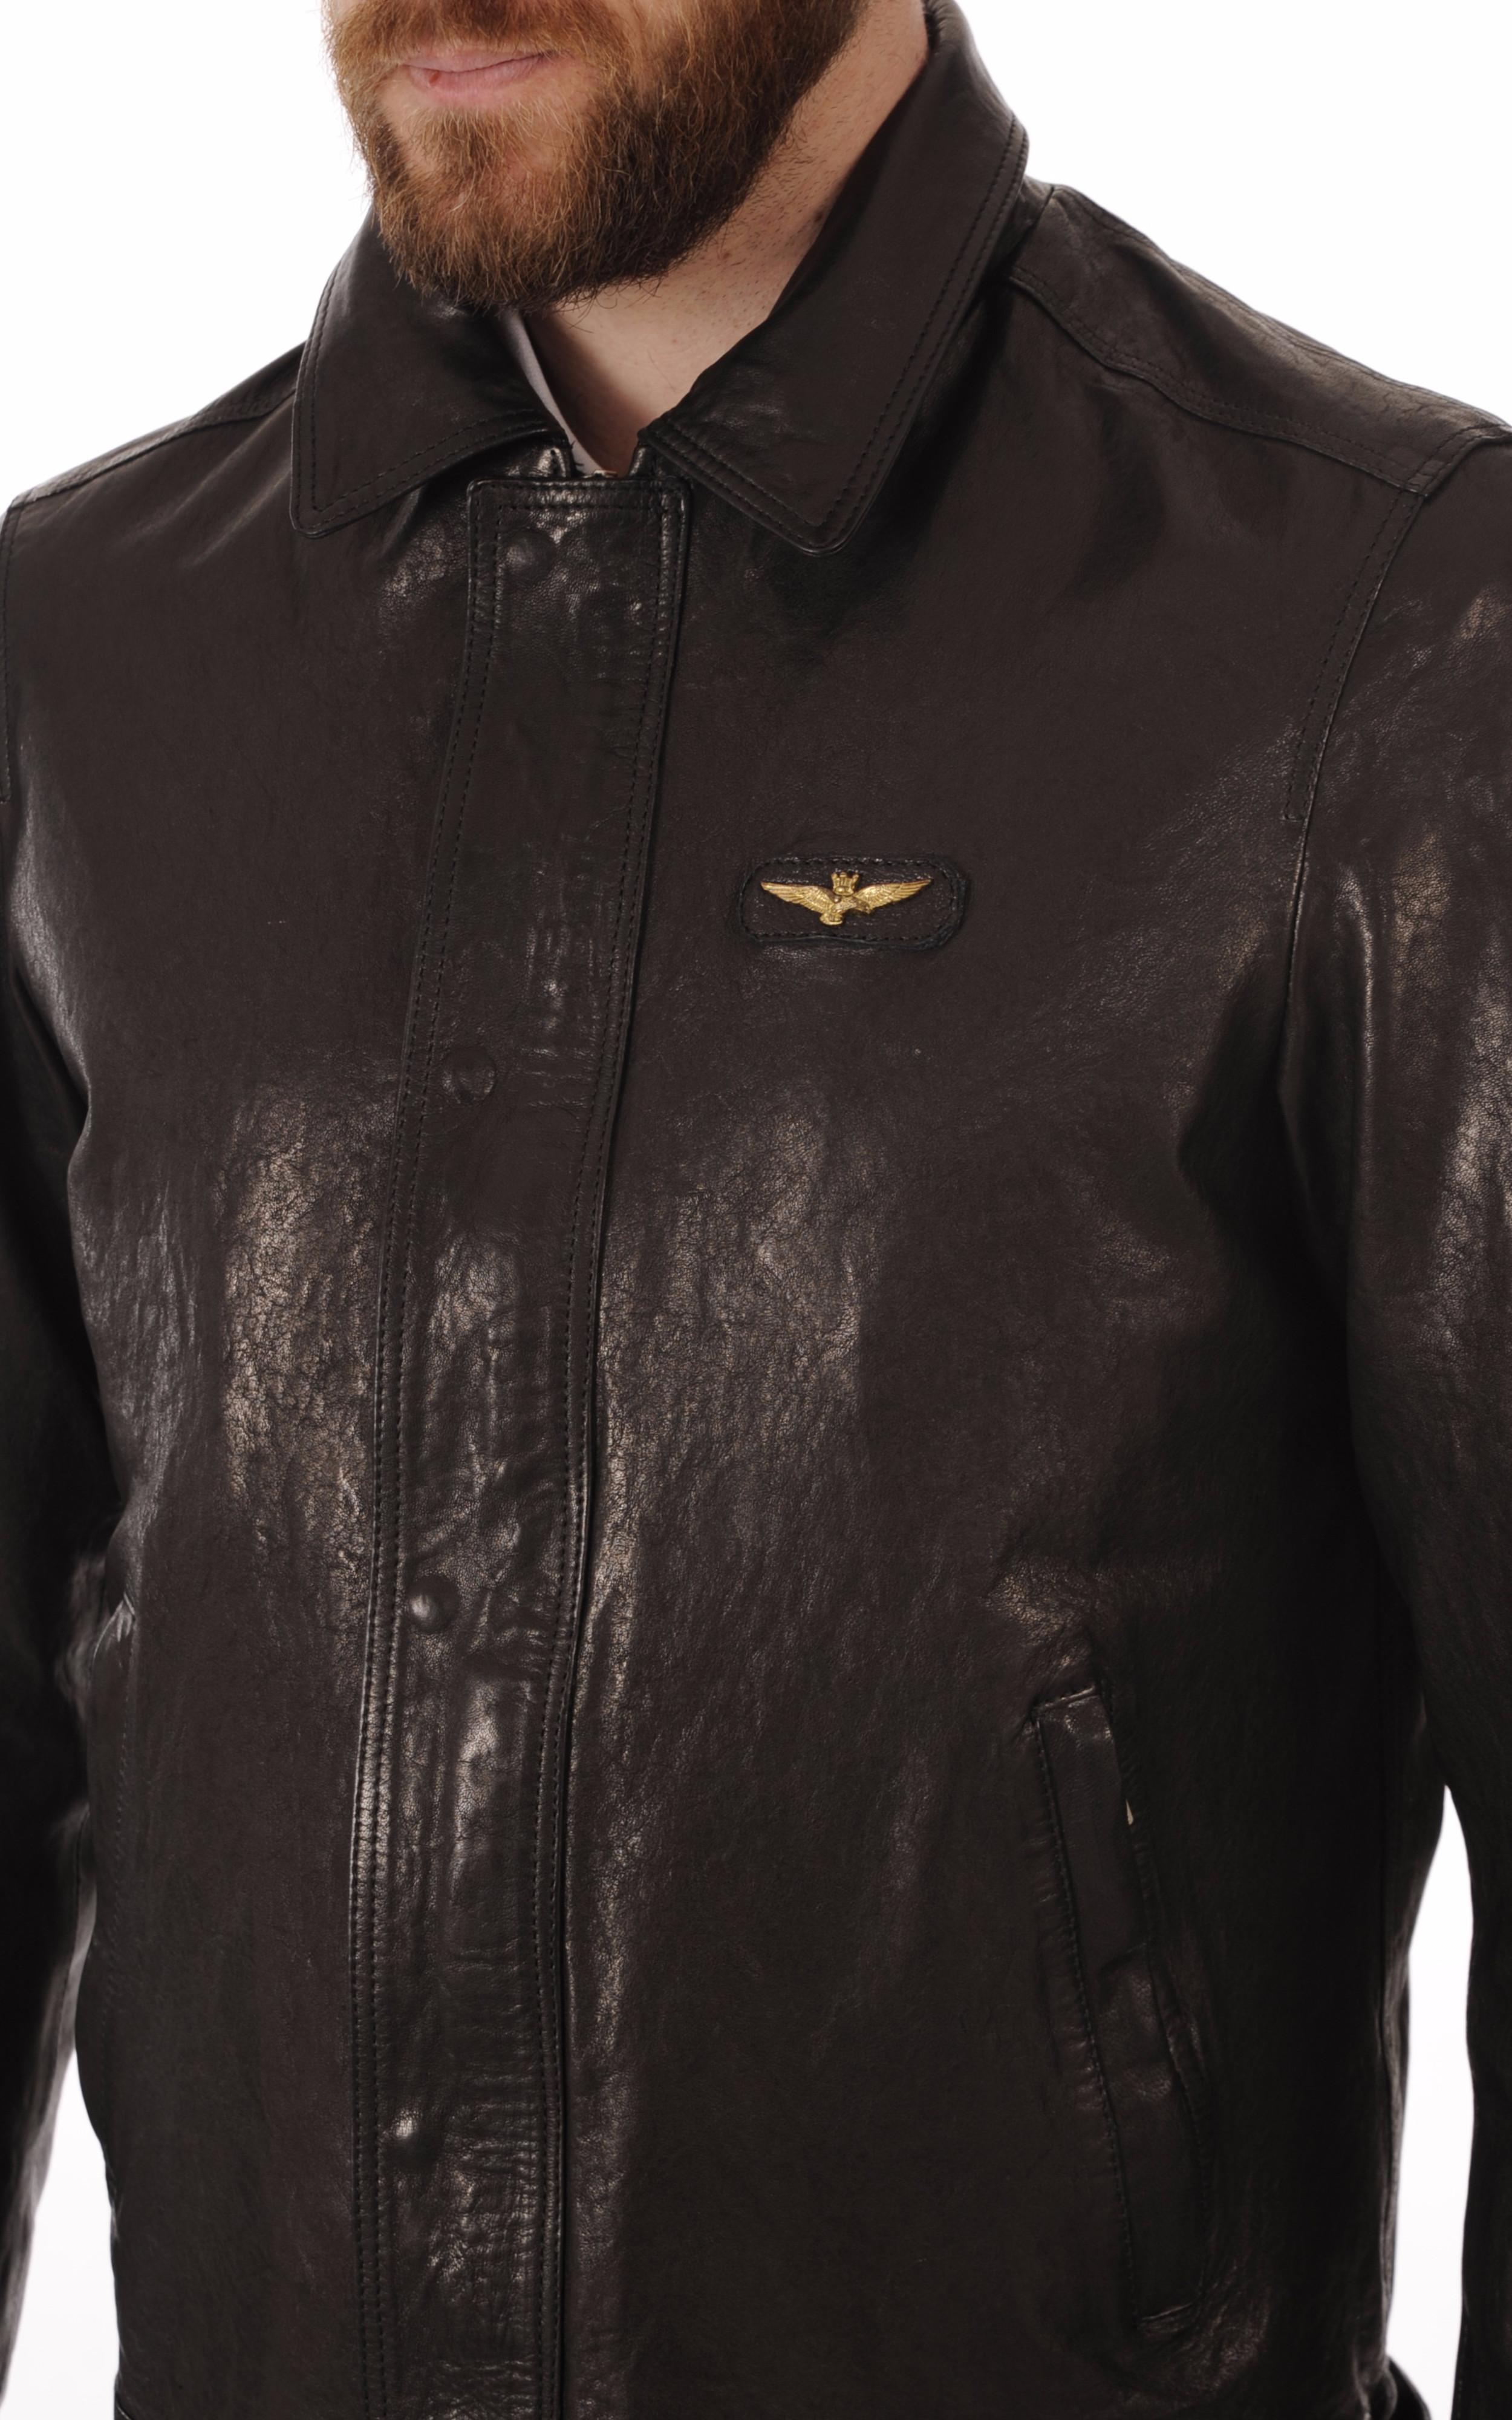 Blouson Cuir Noir Finition Végétale Aeronautica Militare